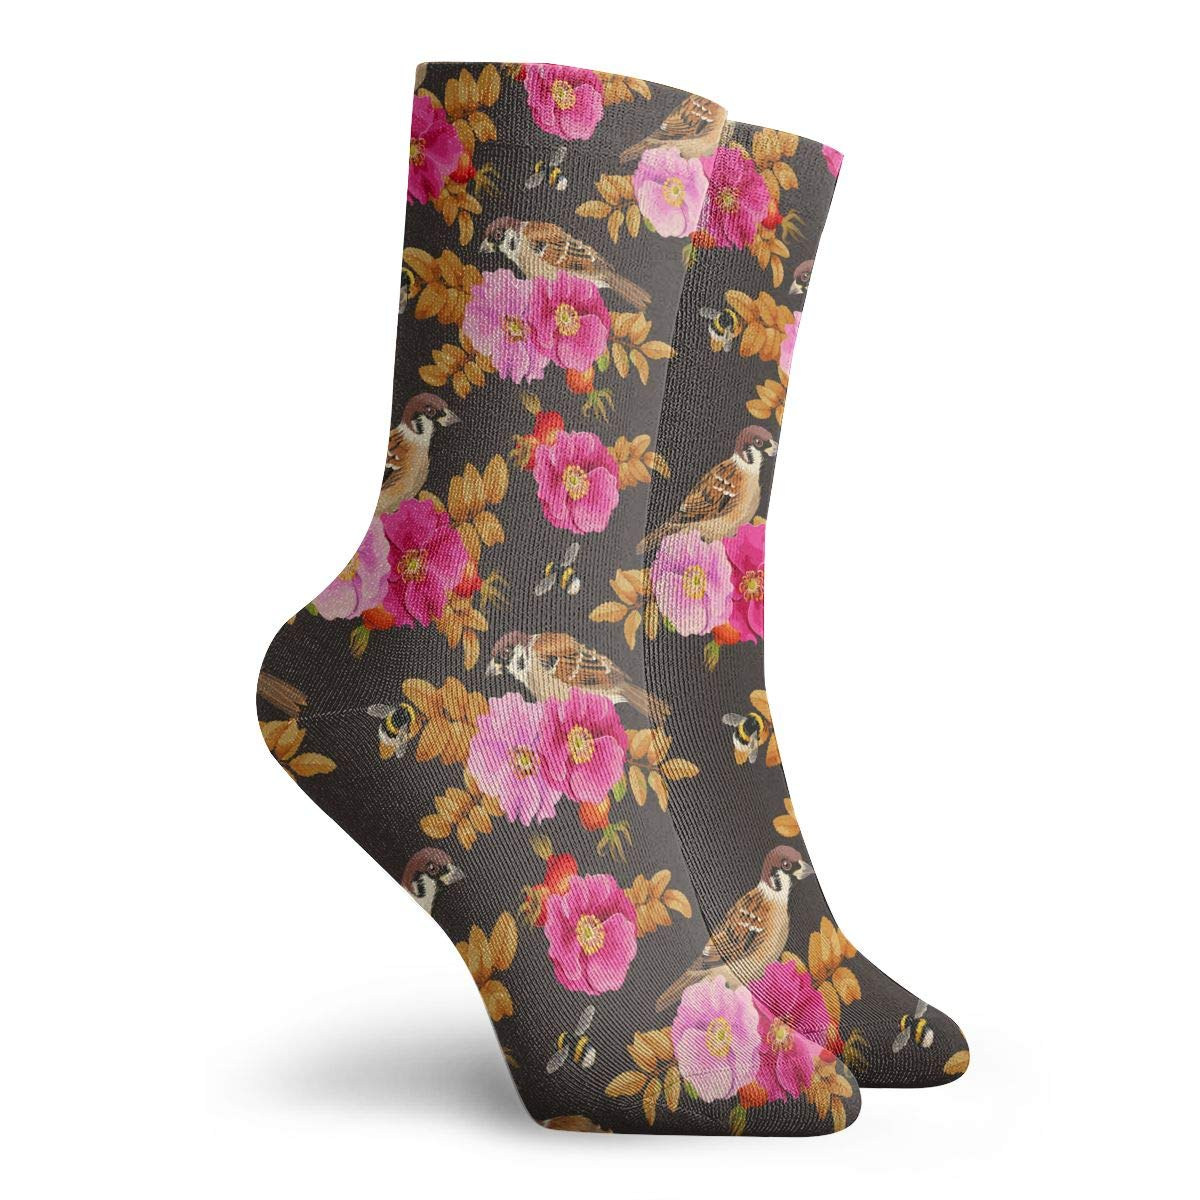 Mens Fashion Performance Polyester Socks Dog-rose And Bird Casual Athletic Crew Socks.